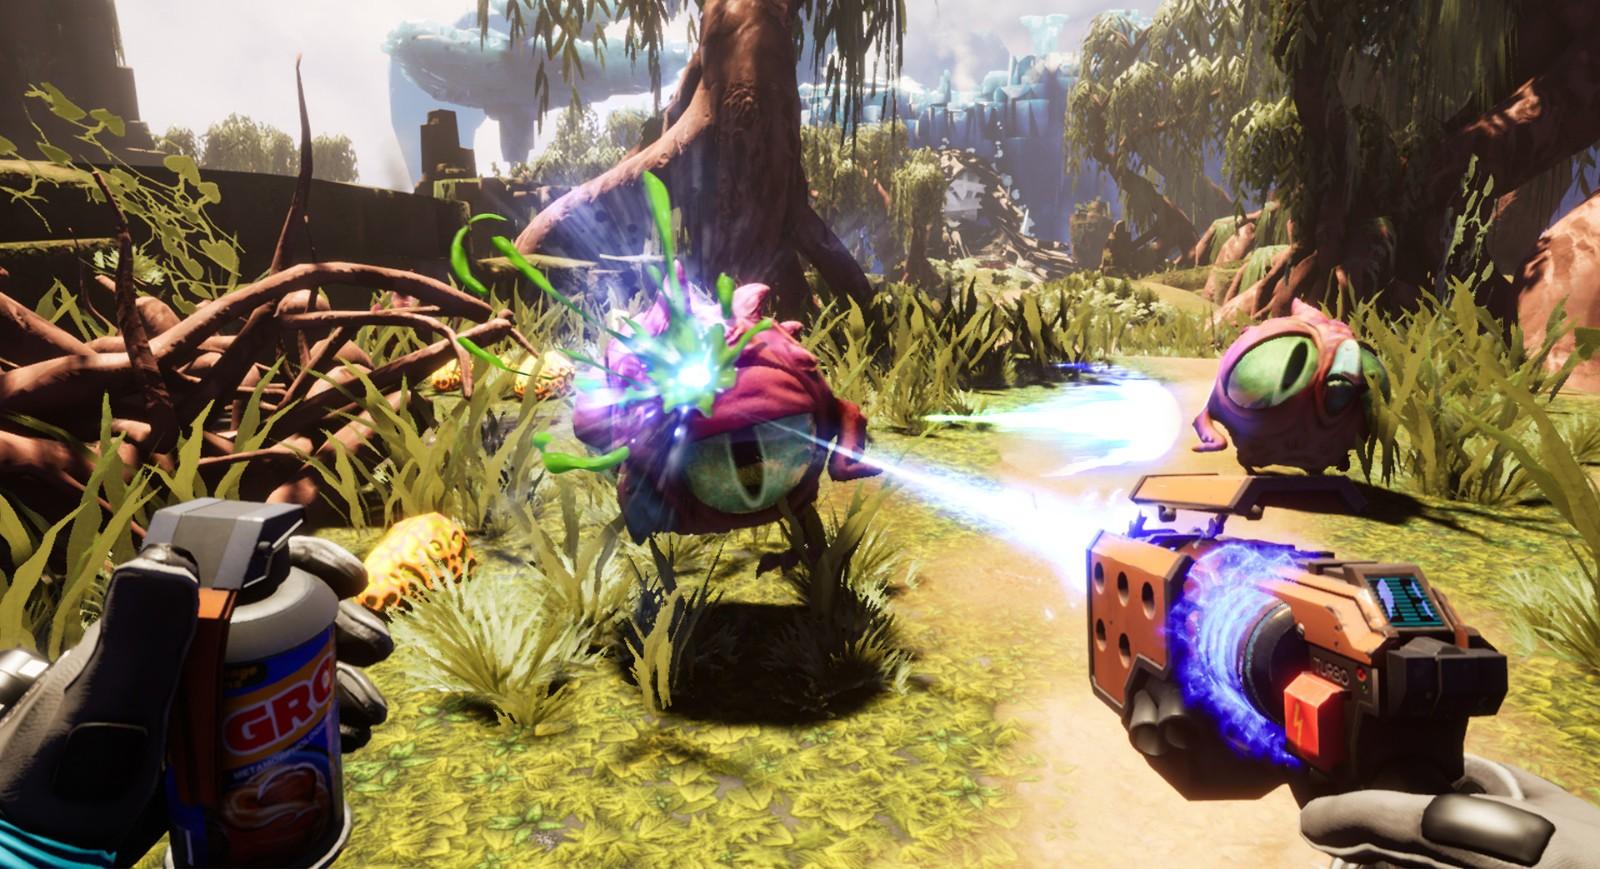 Epic独占一年后 《狂野星球之旅》即将登陆Steam